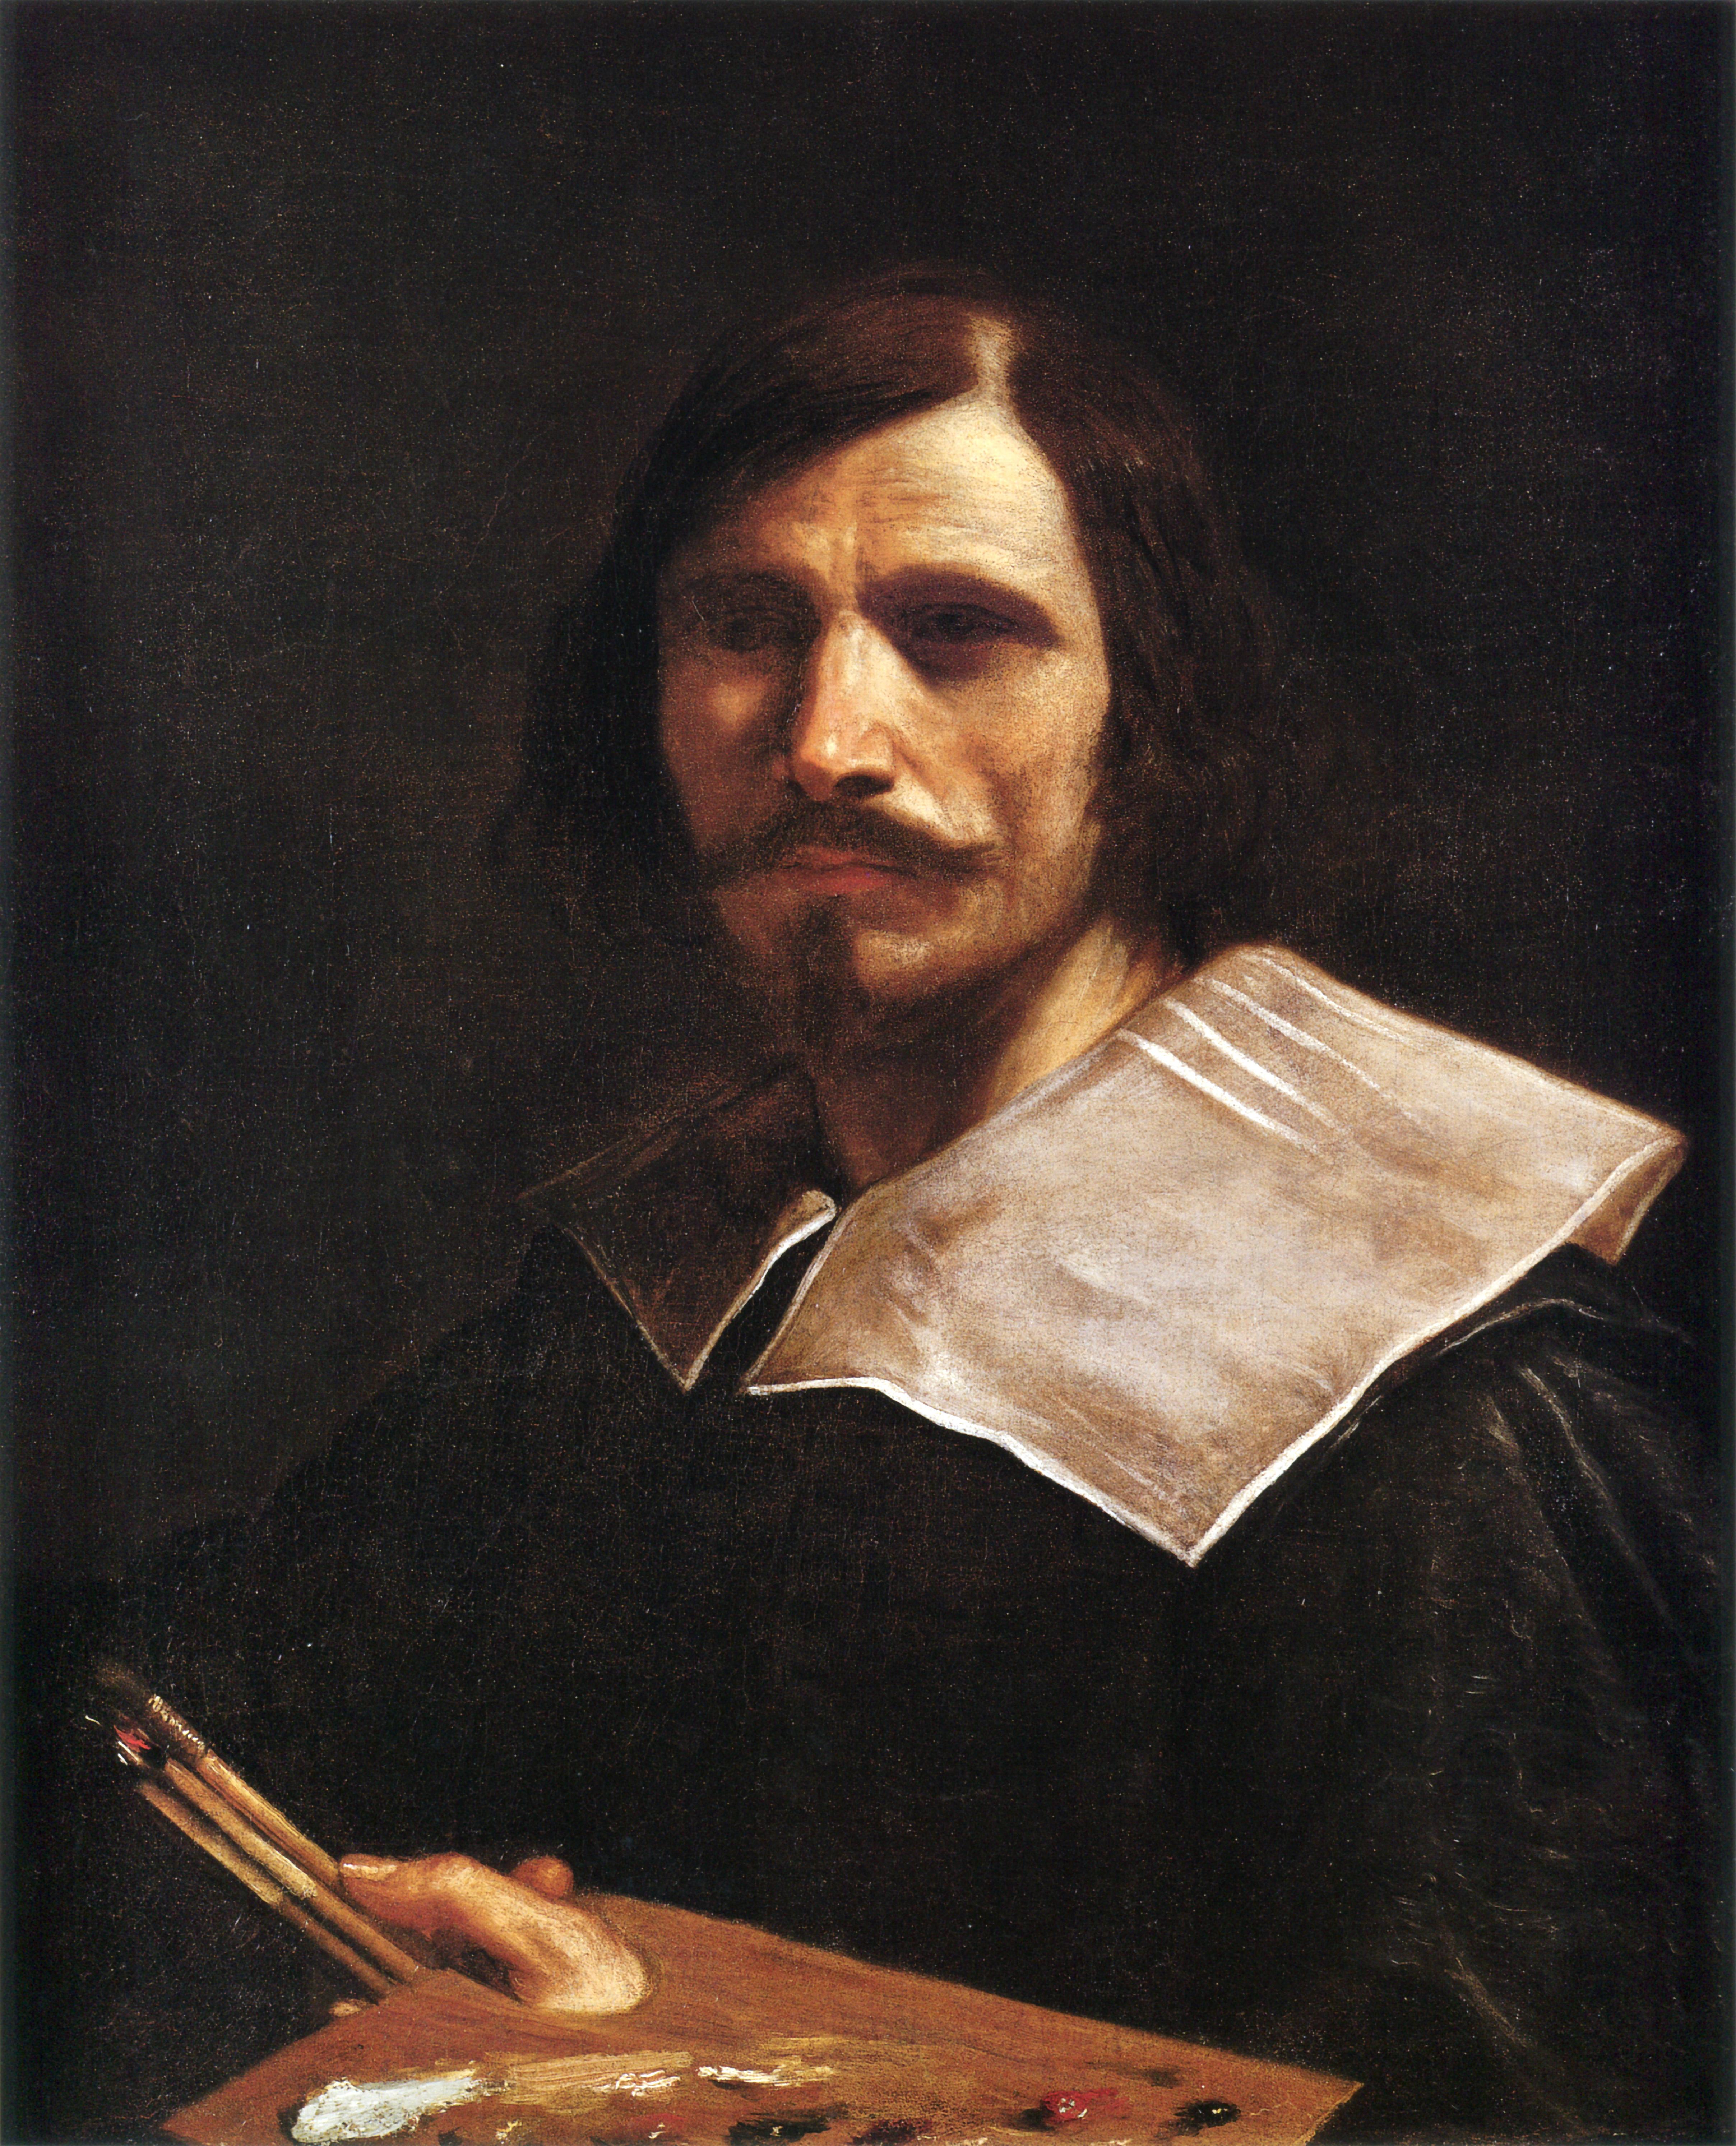 What Political Ideas Influenced Guido Renis Art